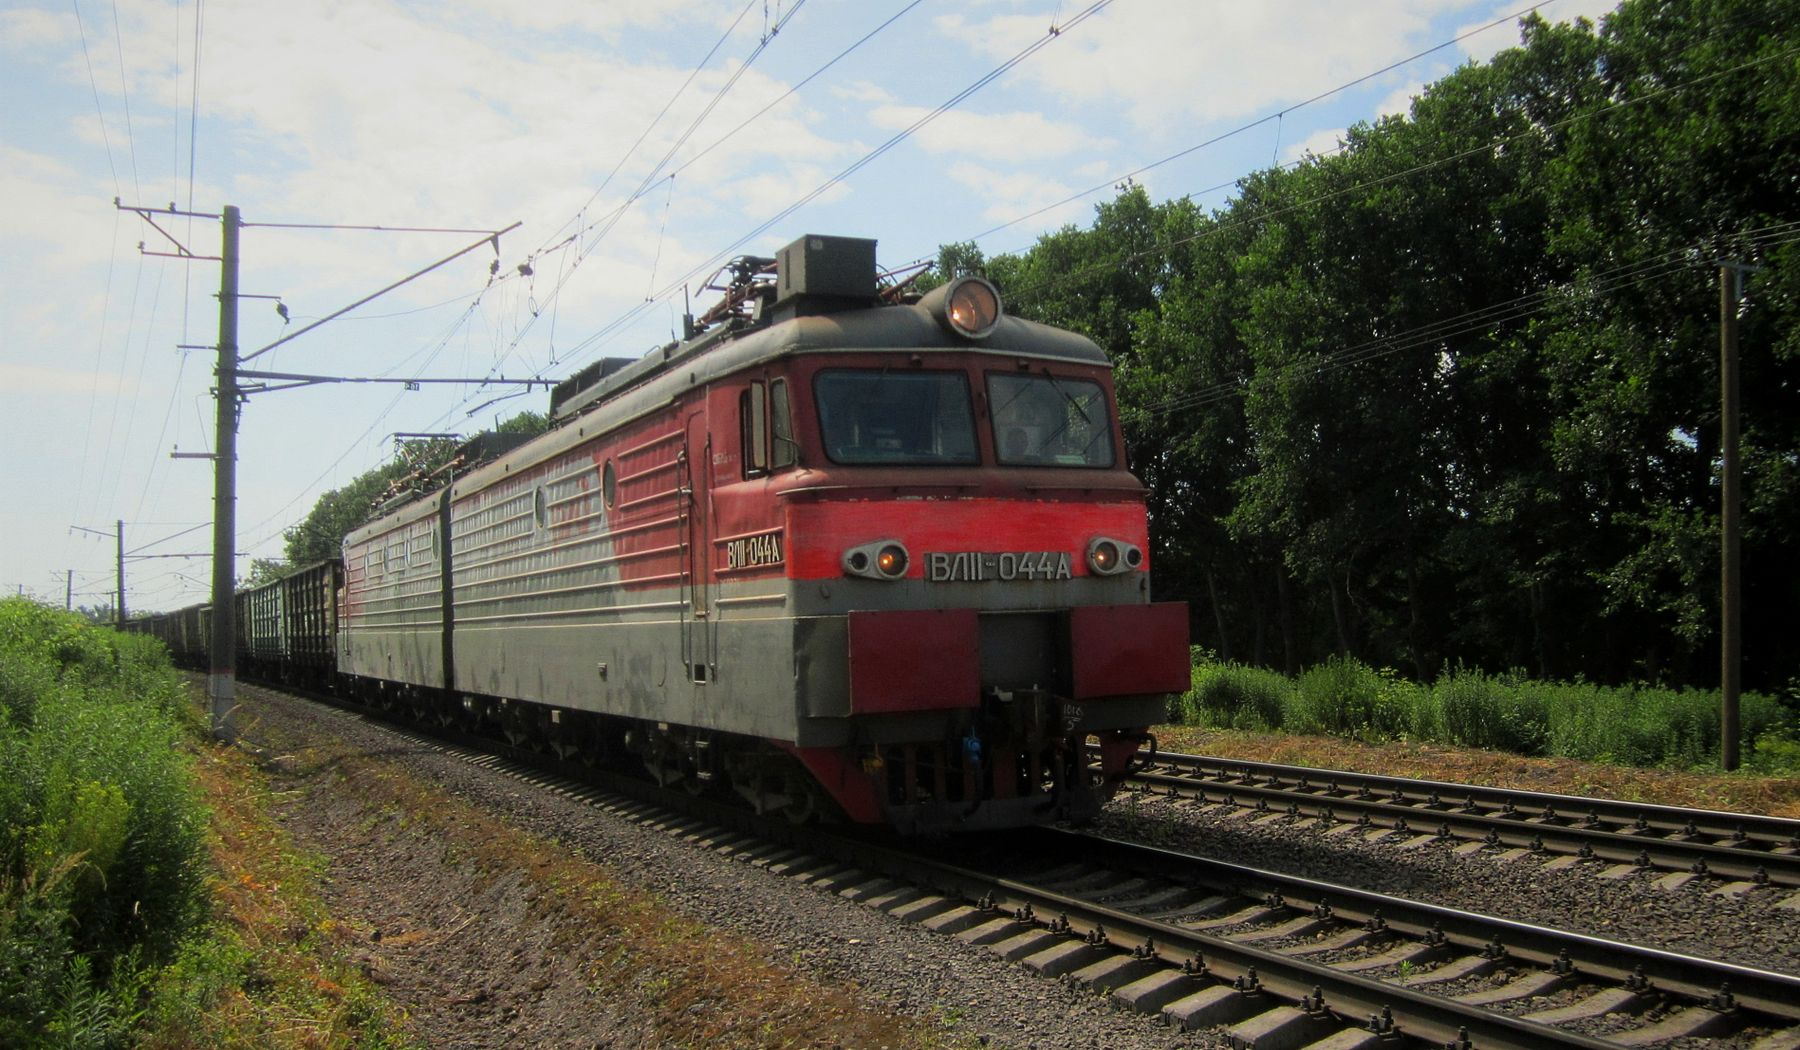 ВЛ11 - 044А ВЛ11 электровоз лето железная дорога